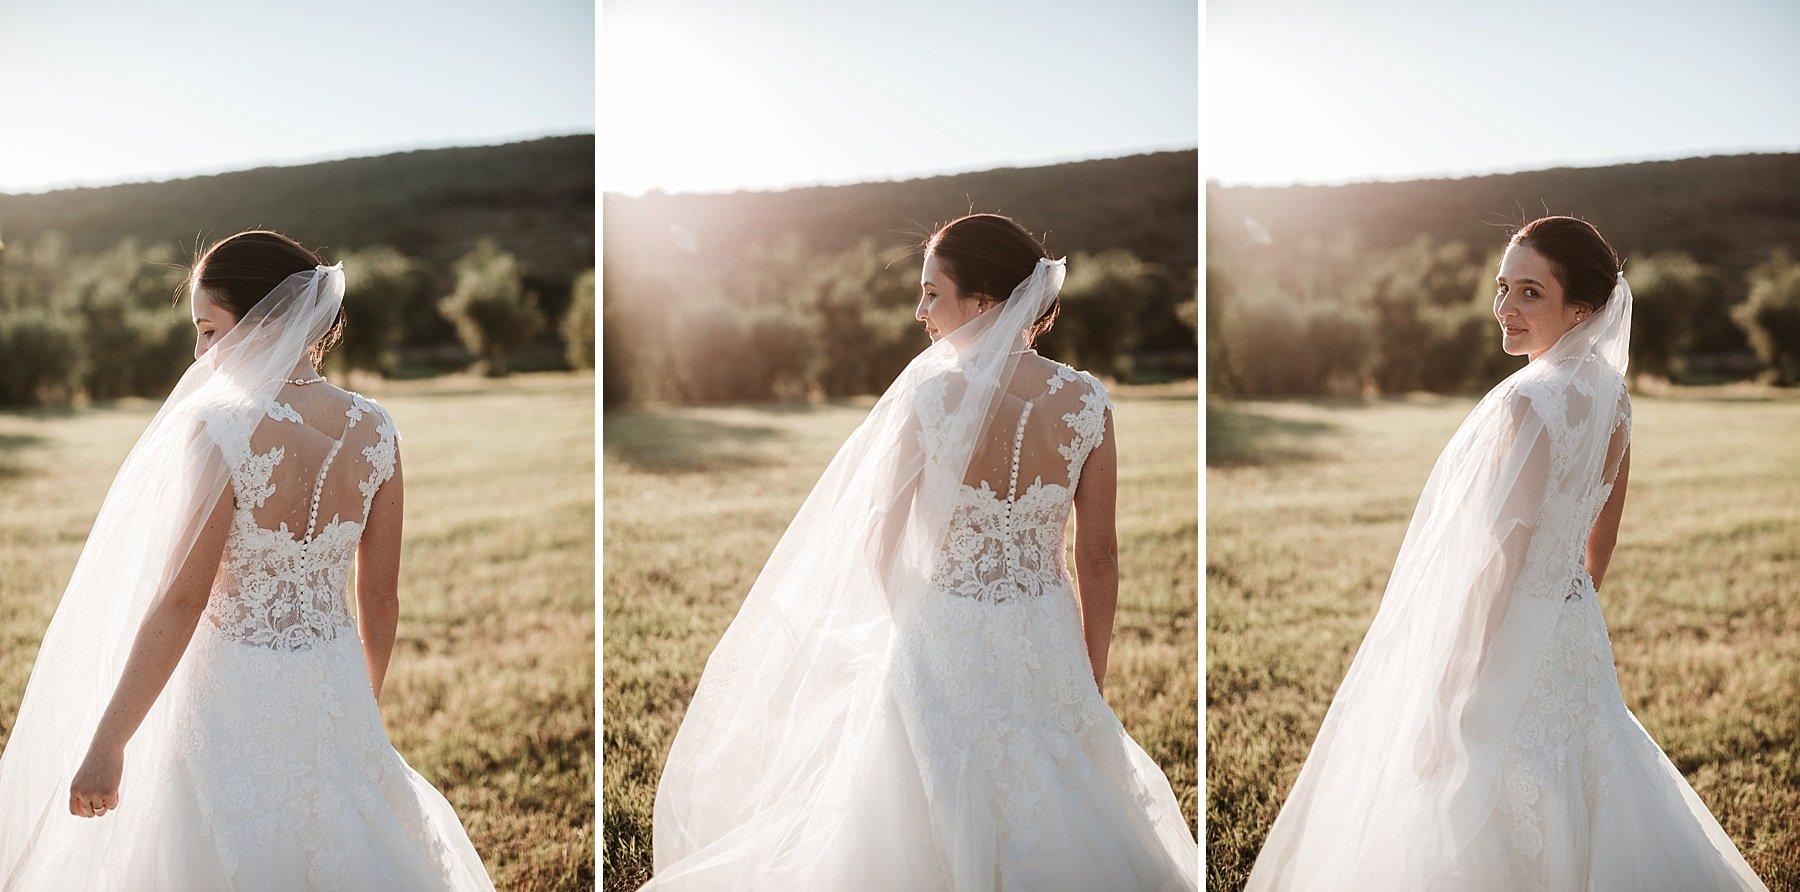 Sposa fotografata di spalle in controluce